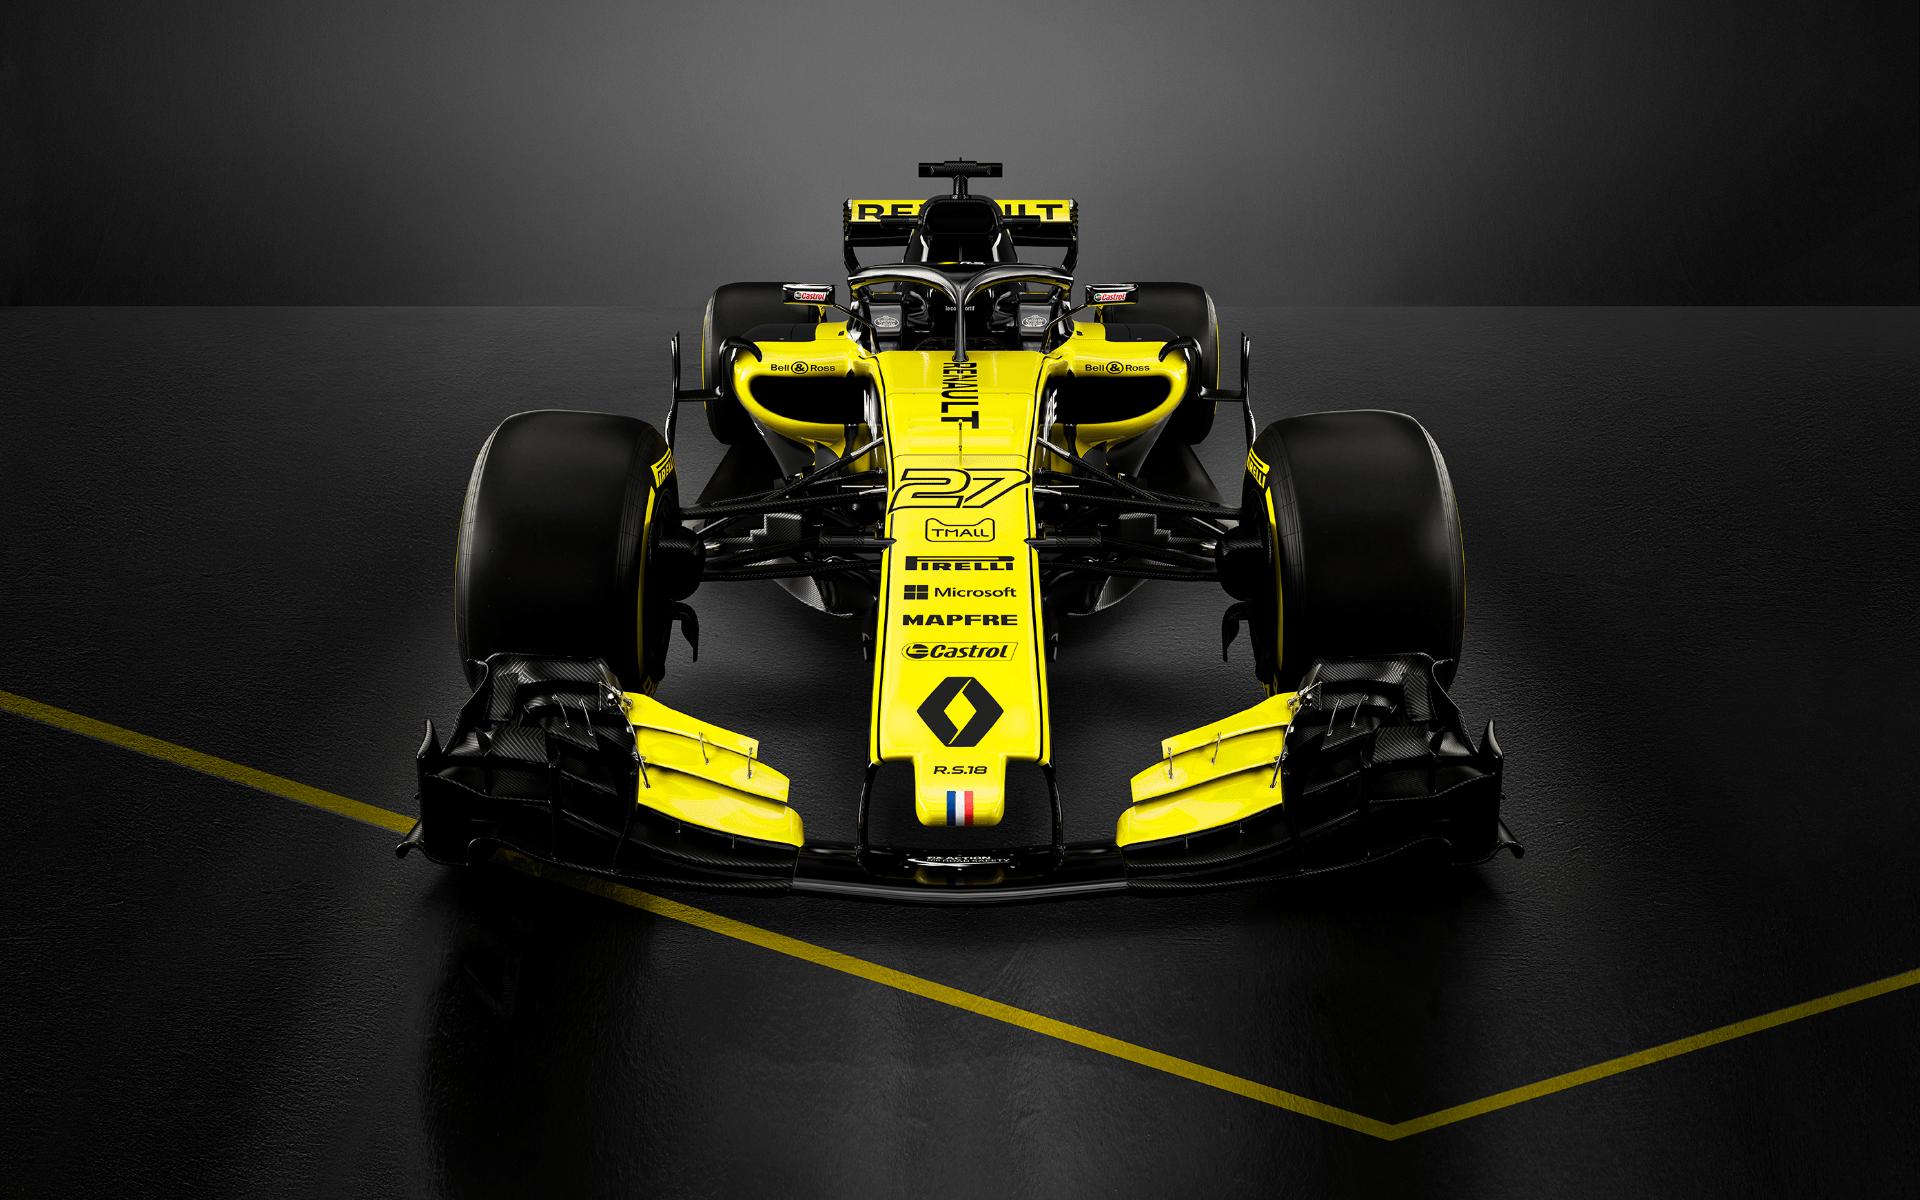 Renault Sport Formula One racecar (Photo: Bell & Ross)